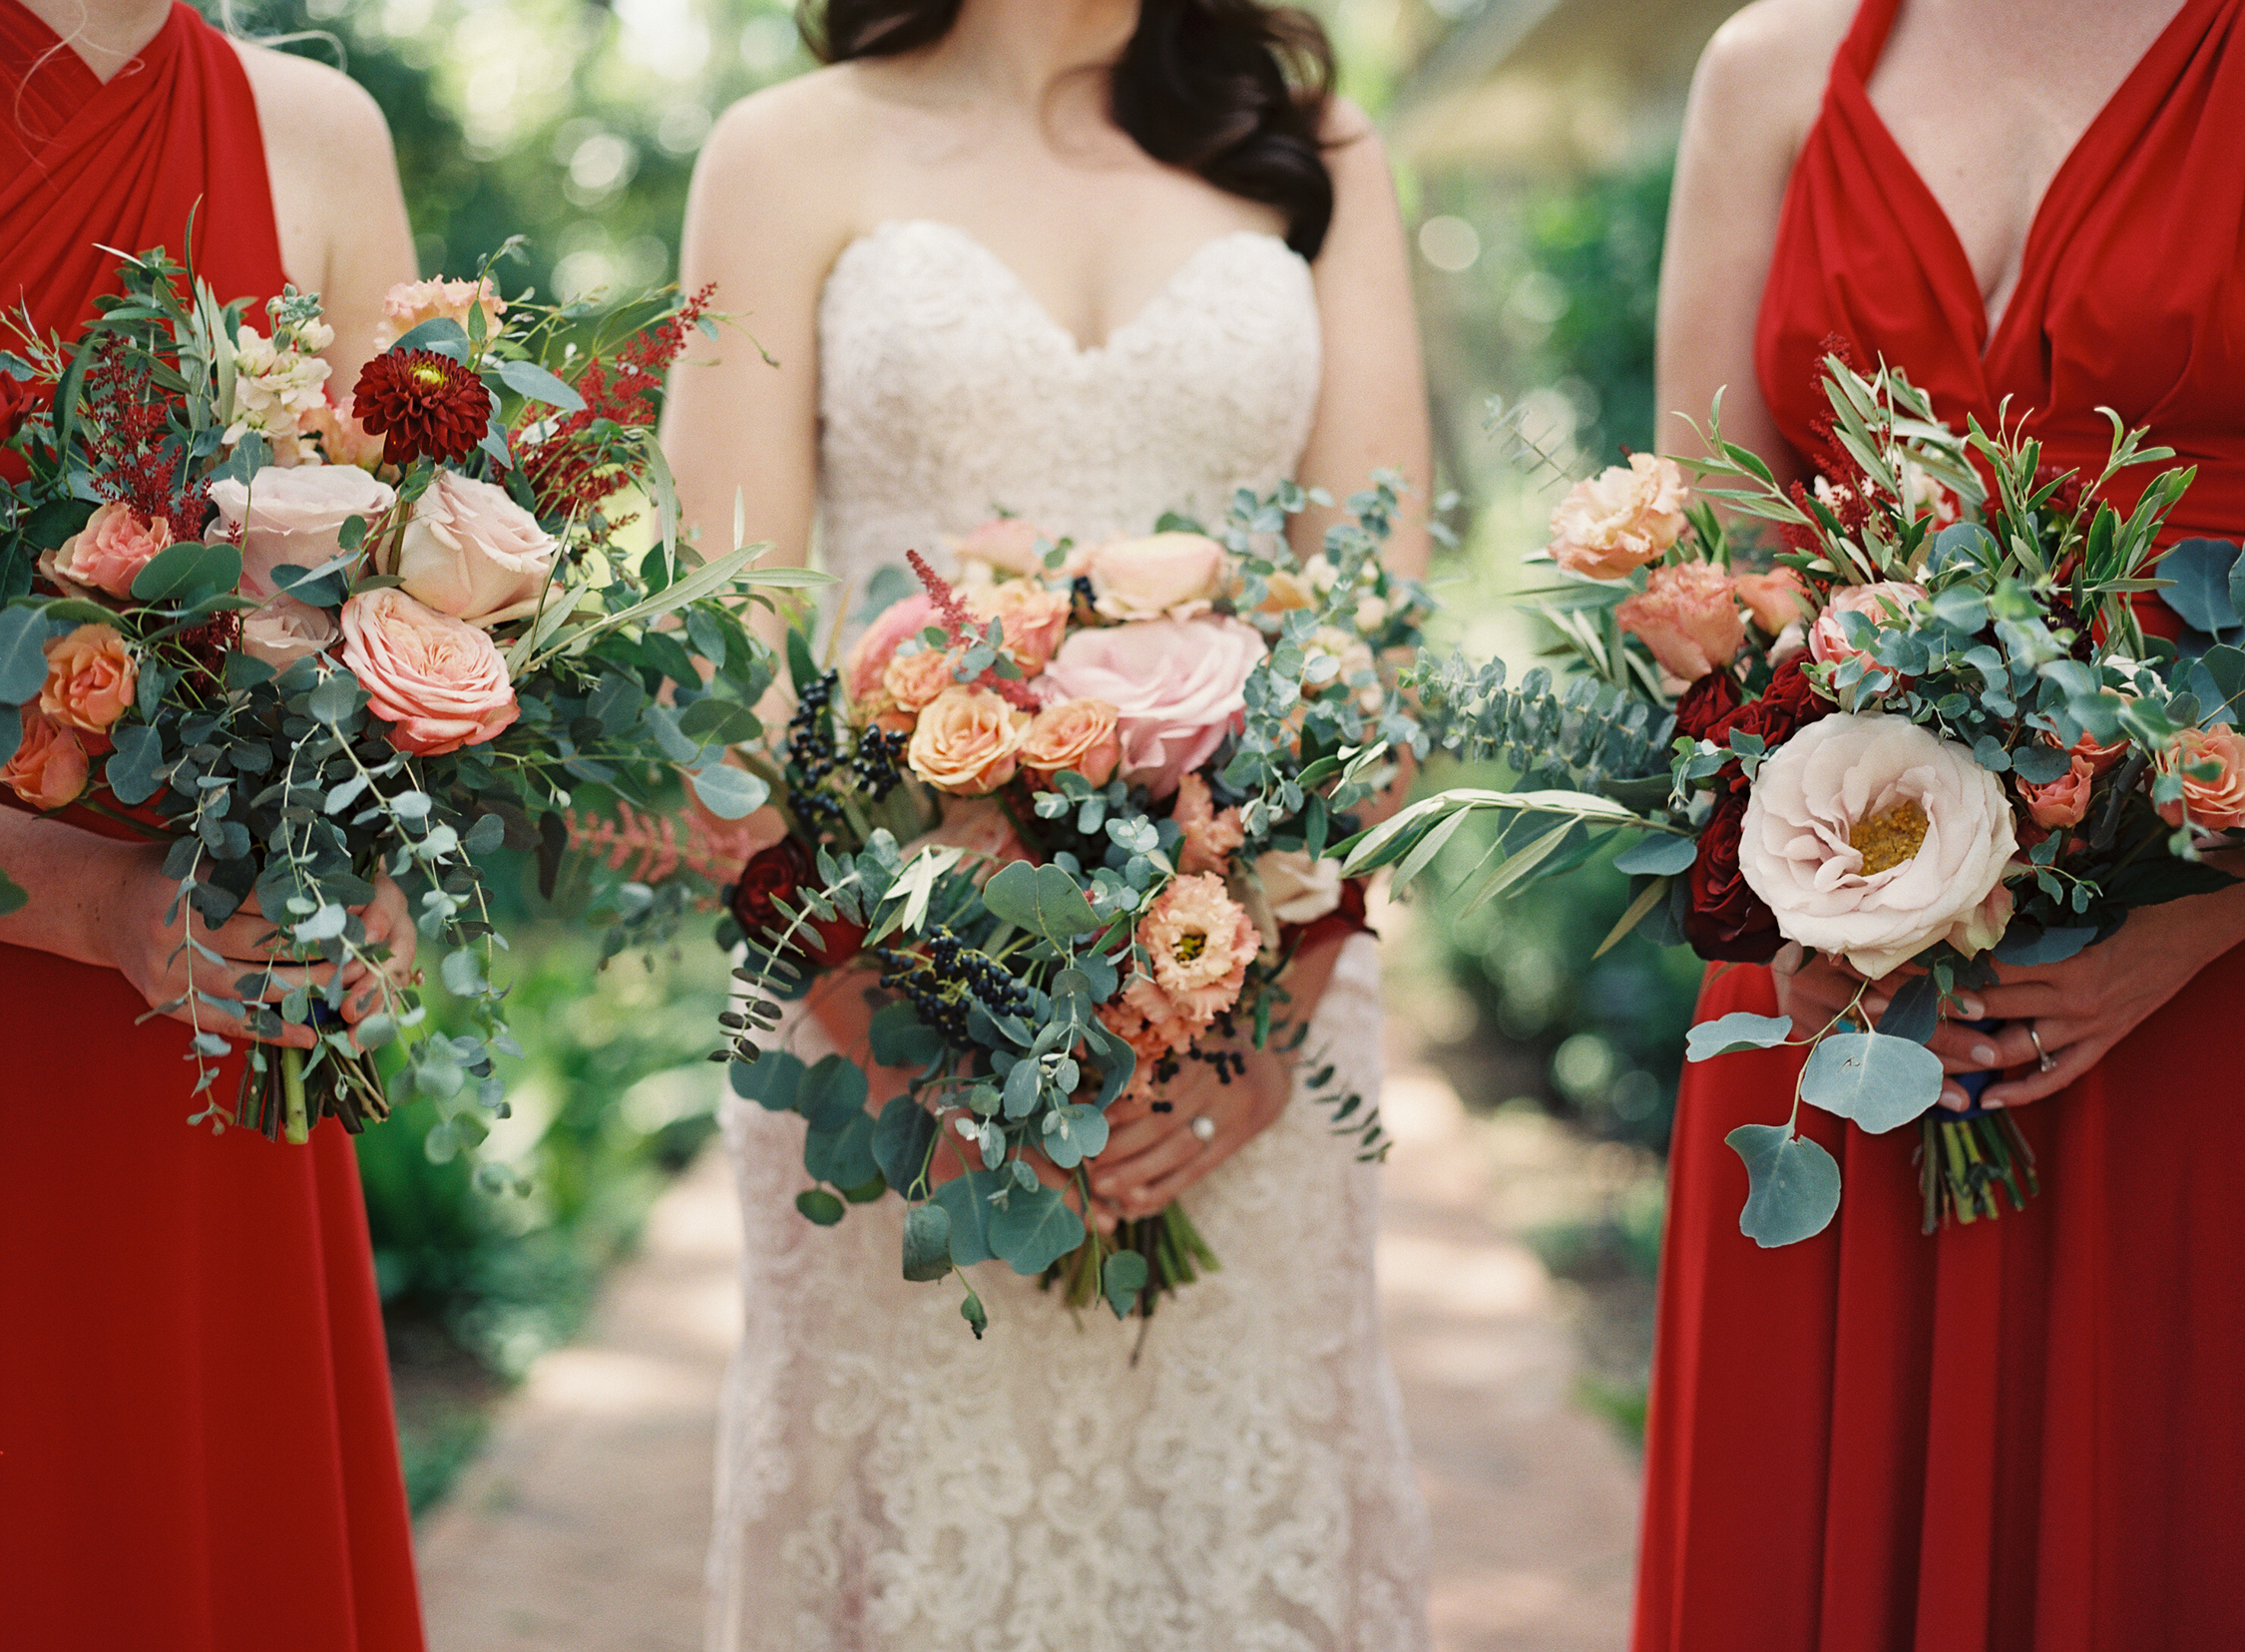 alegria-by-design-wedding-planner-planning-coordination-day-of-event-design-el-encanto-resort-riviera-garden-lily-pond-outdoor-red-navy (3).jpg